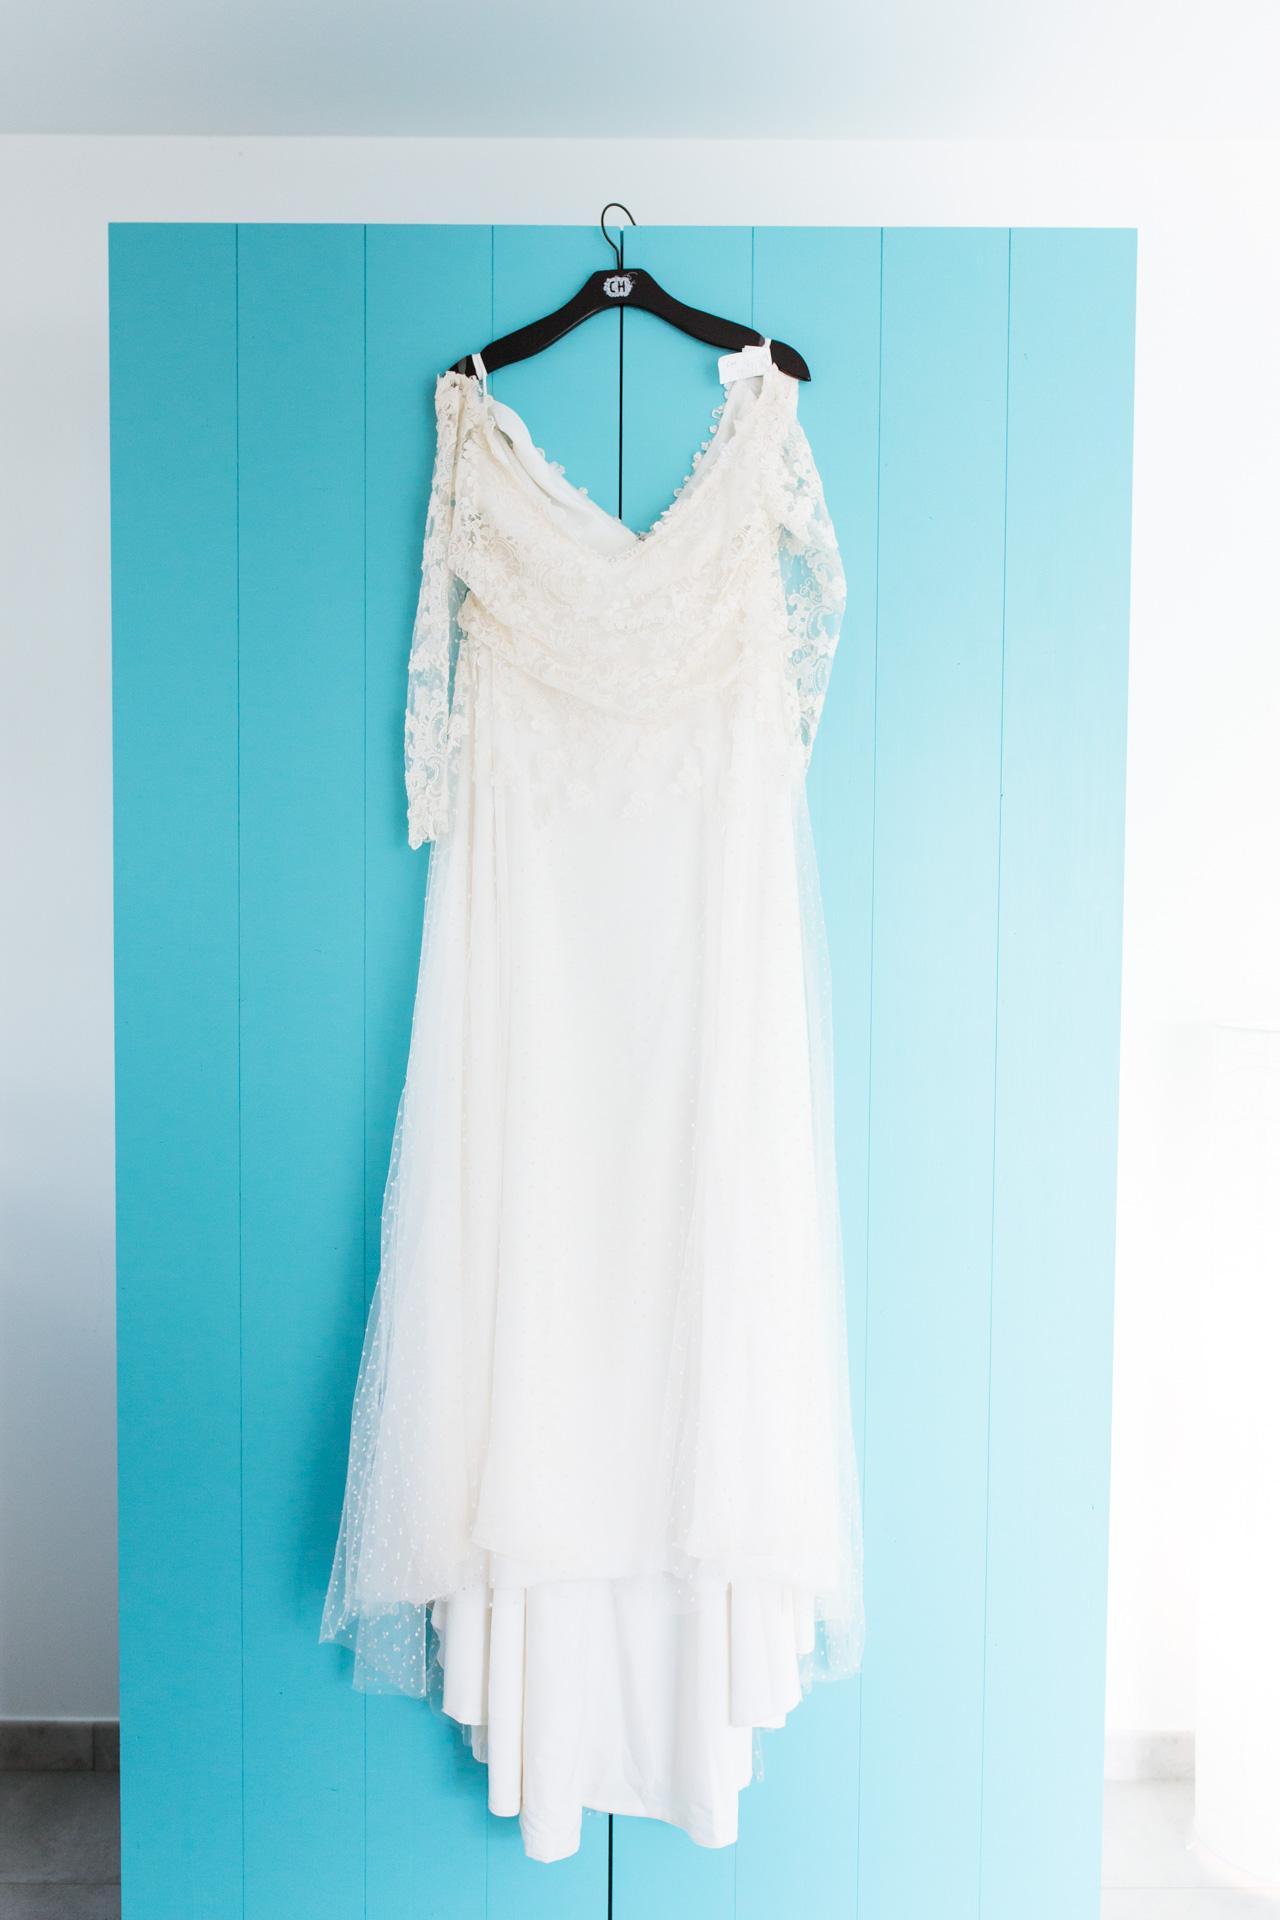 robe de mariee suspendu armoire turquoise